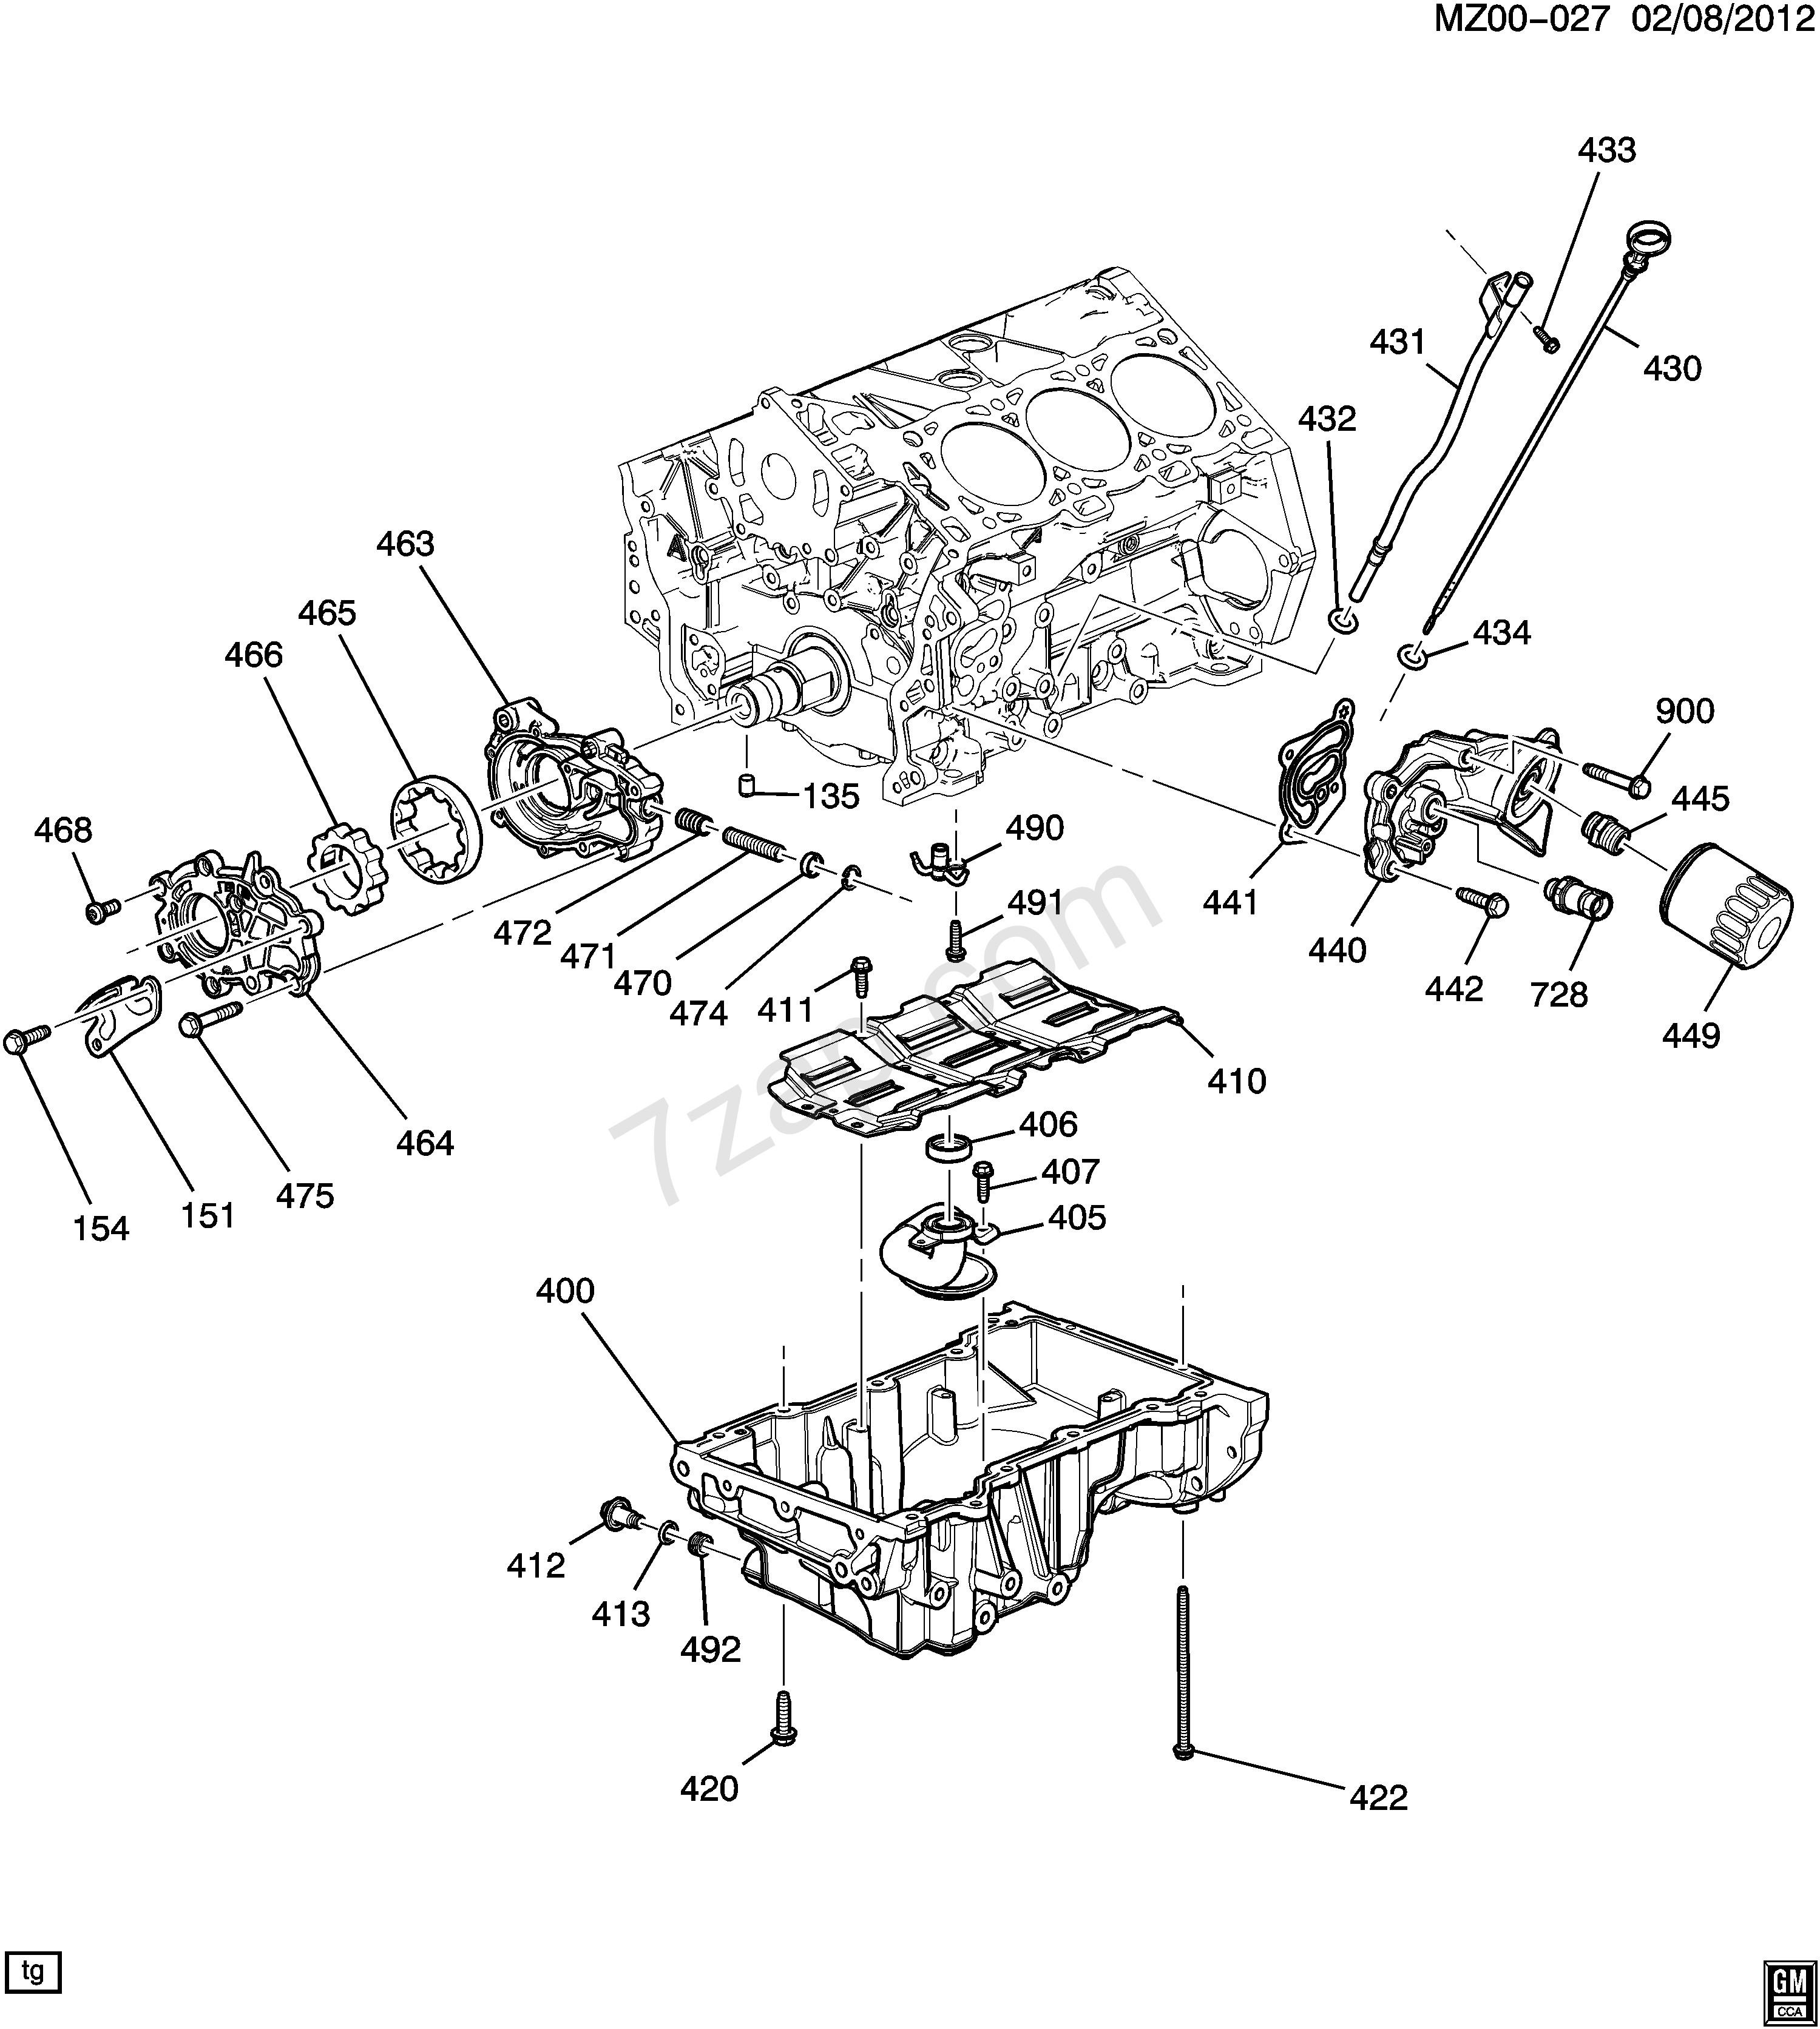 Flat Head Engine Diagram Rolls Royce Merlin Supercharger Cutaway Diagrams 2009 2010 Rv1 Asm 3 6l V6 Part 5 Oil Pump